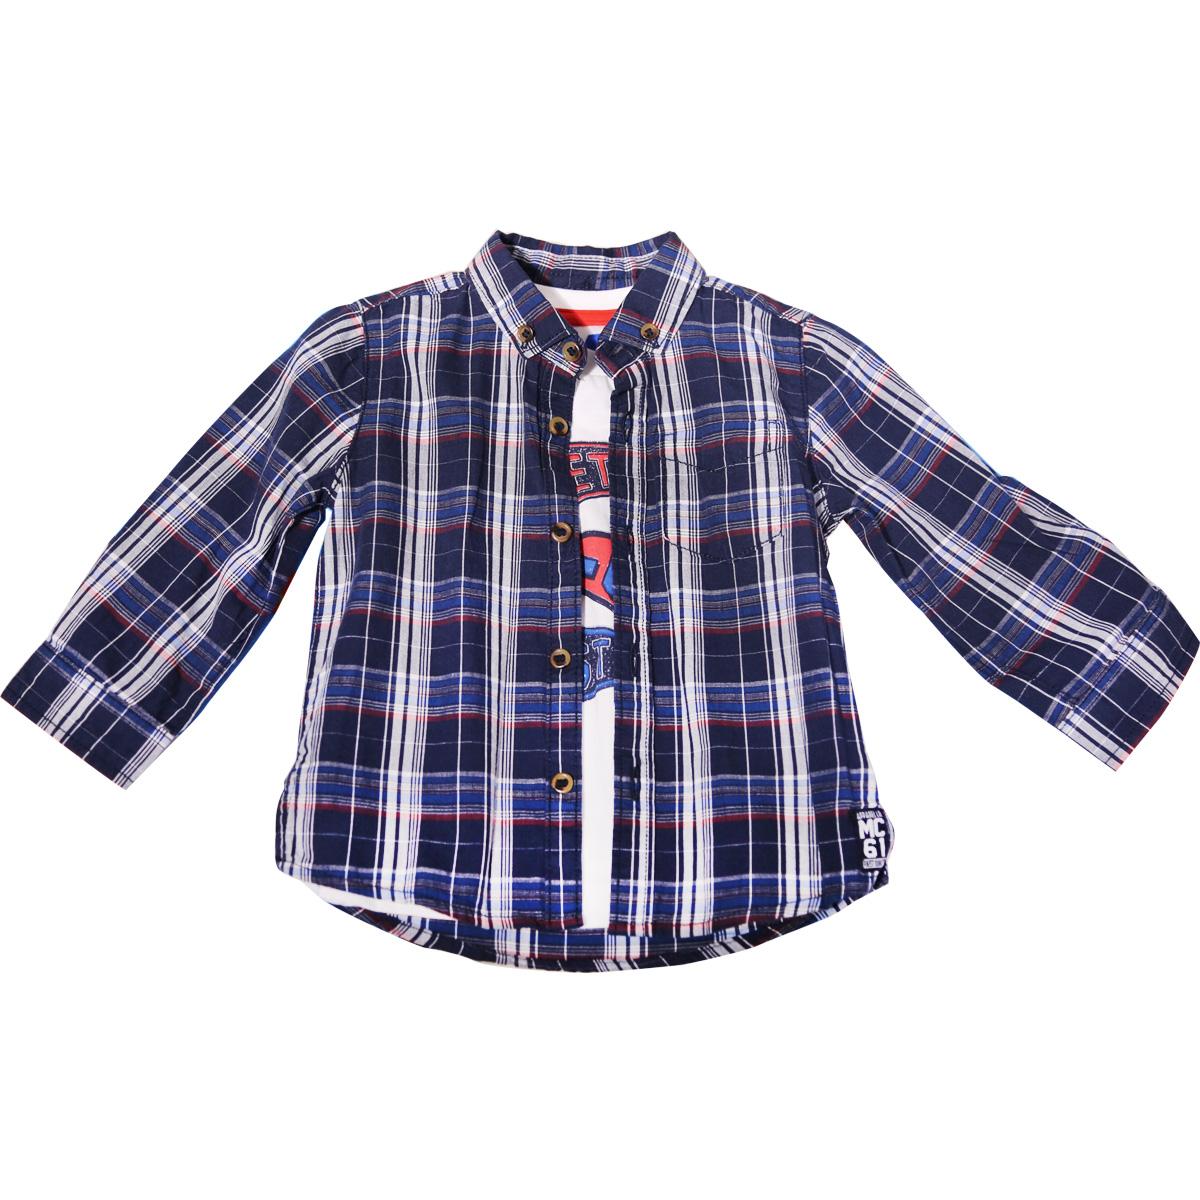 mothercare儿童短袖T恤男婴小童薄棉质长袖格纹衬衫印花T恤衫套装